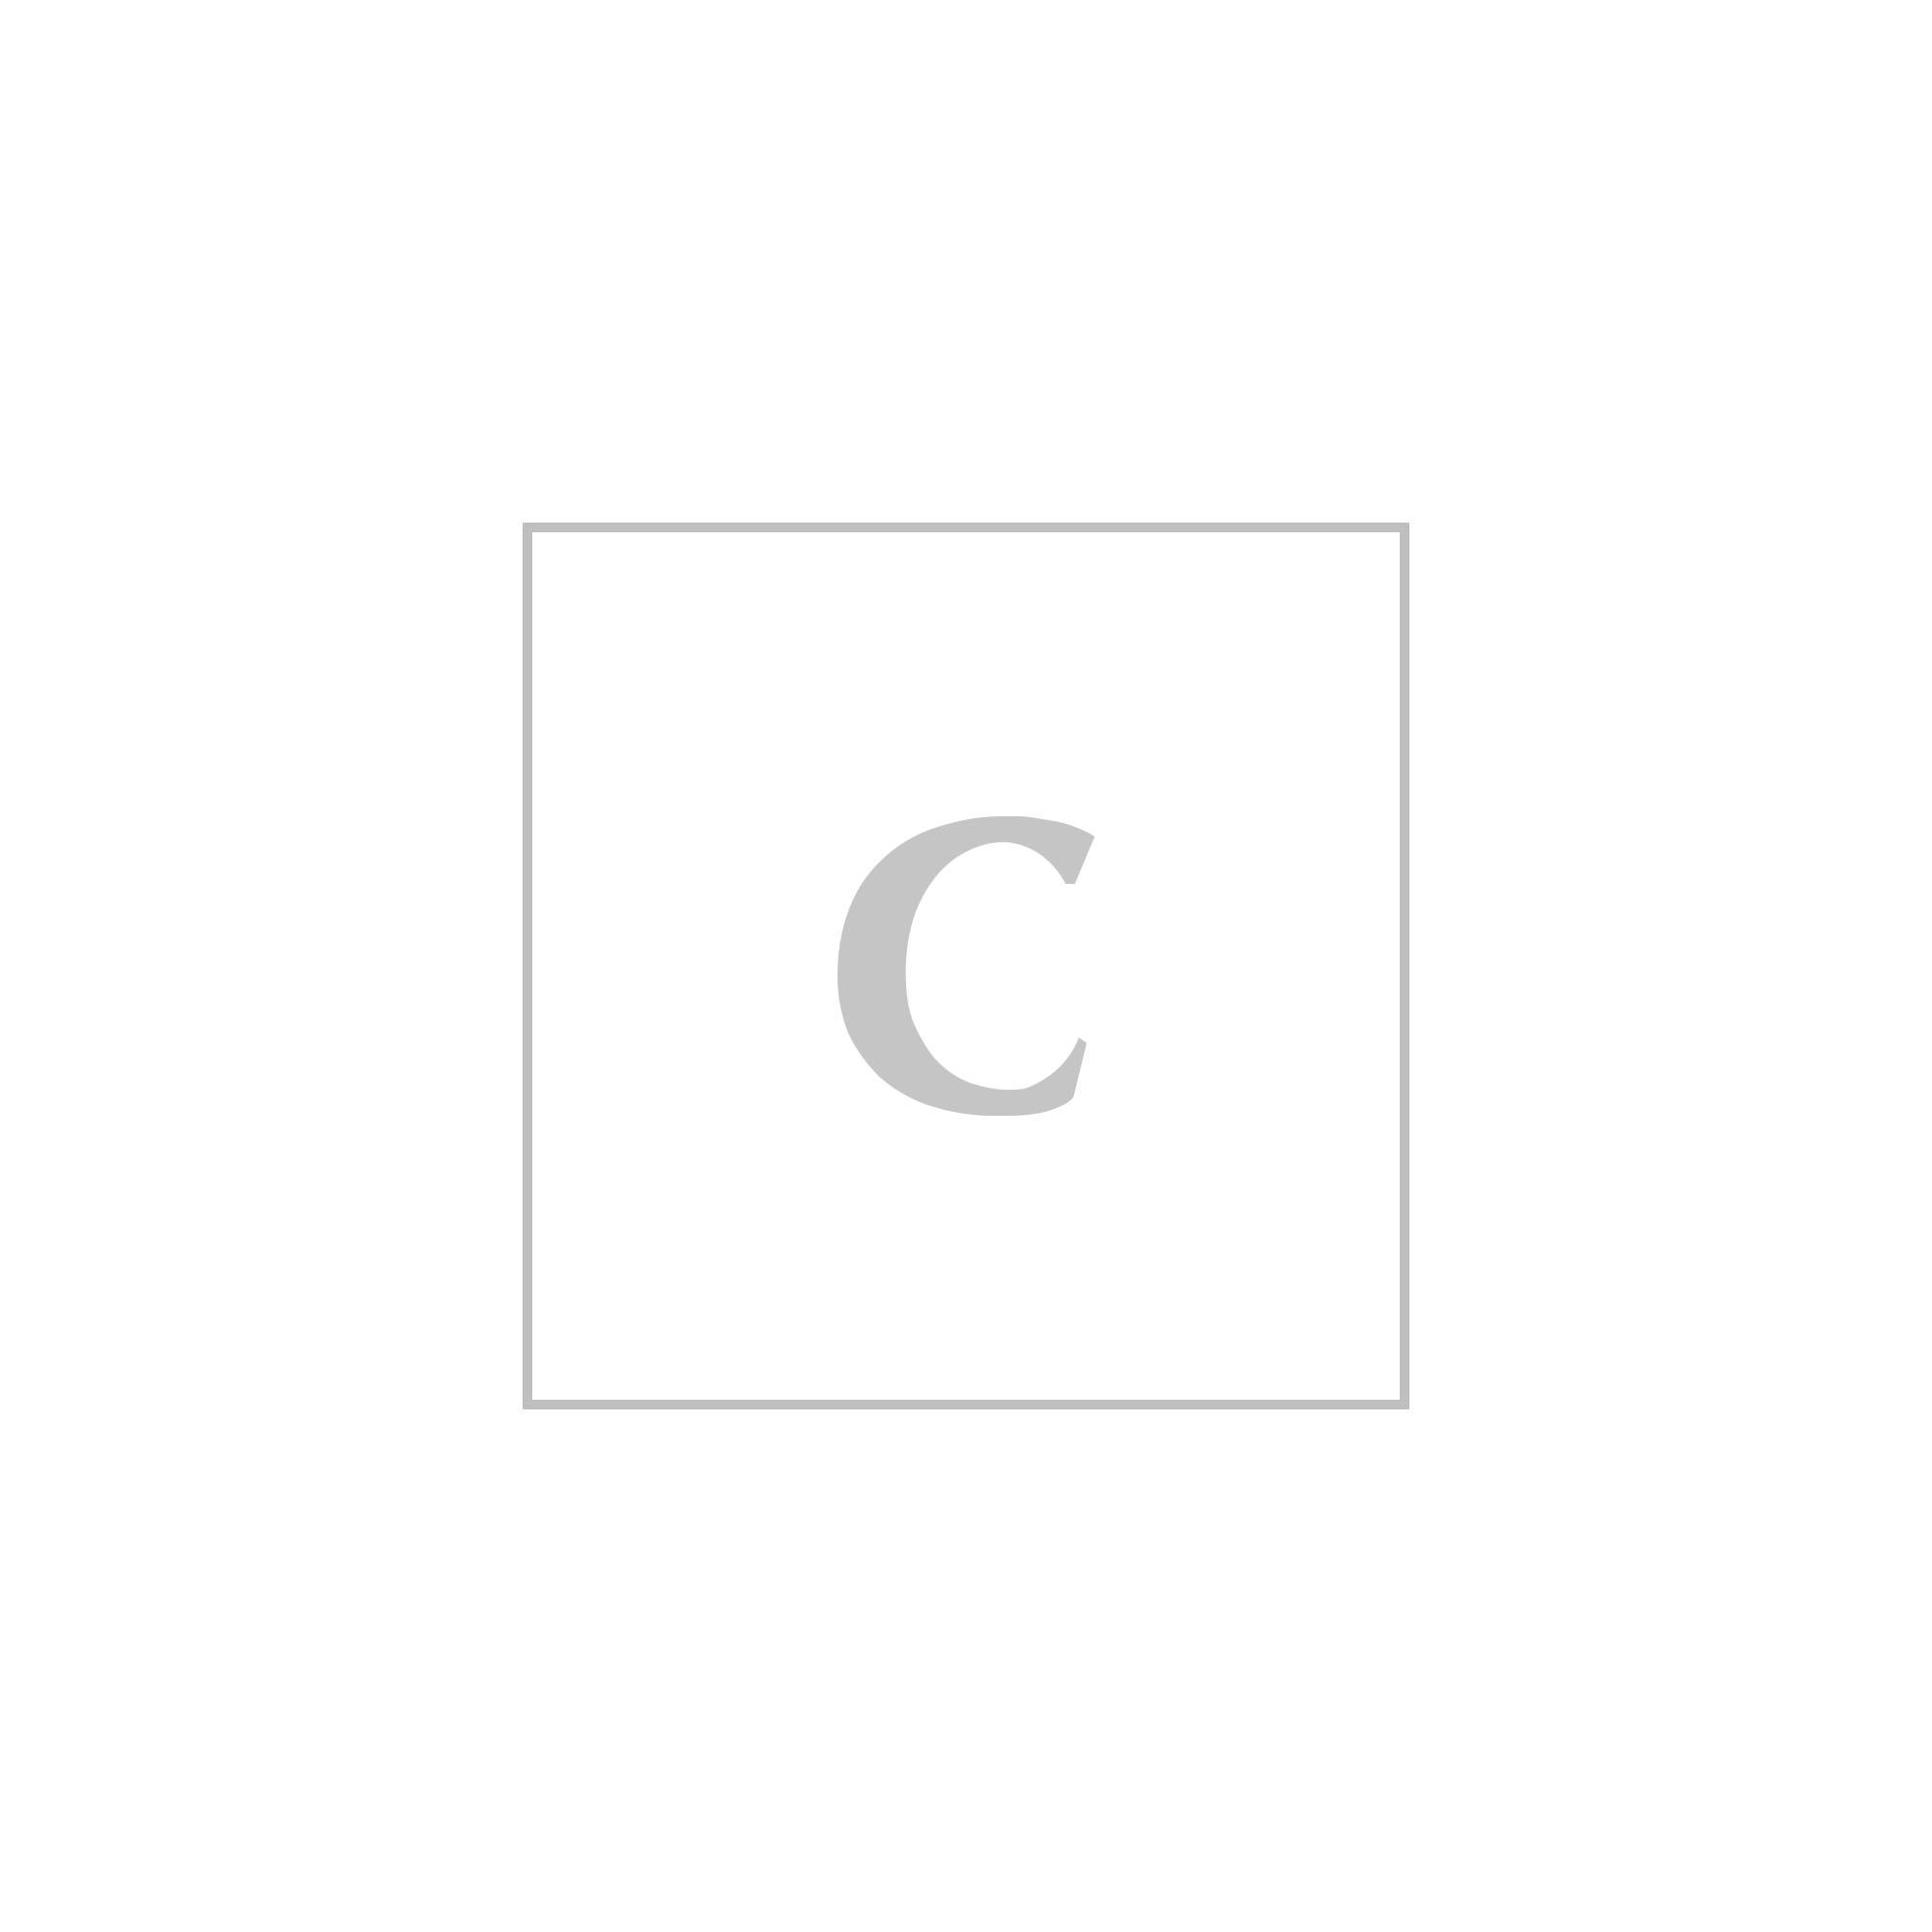 Christian Dior borsa miss dior tricolor cannag